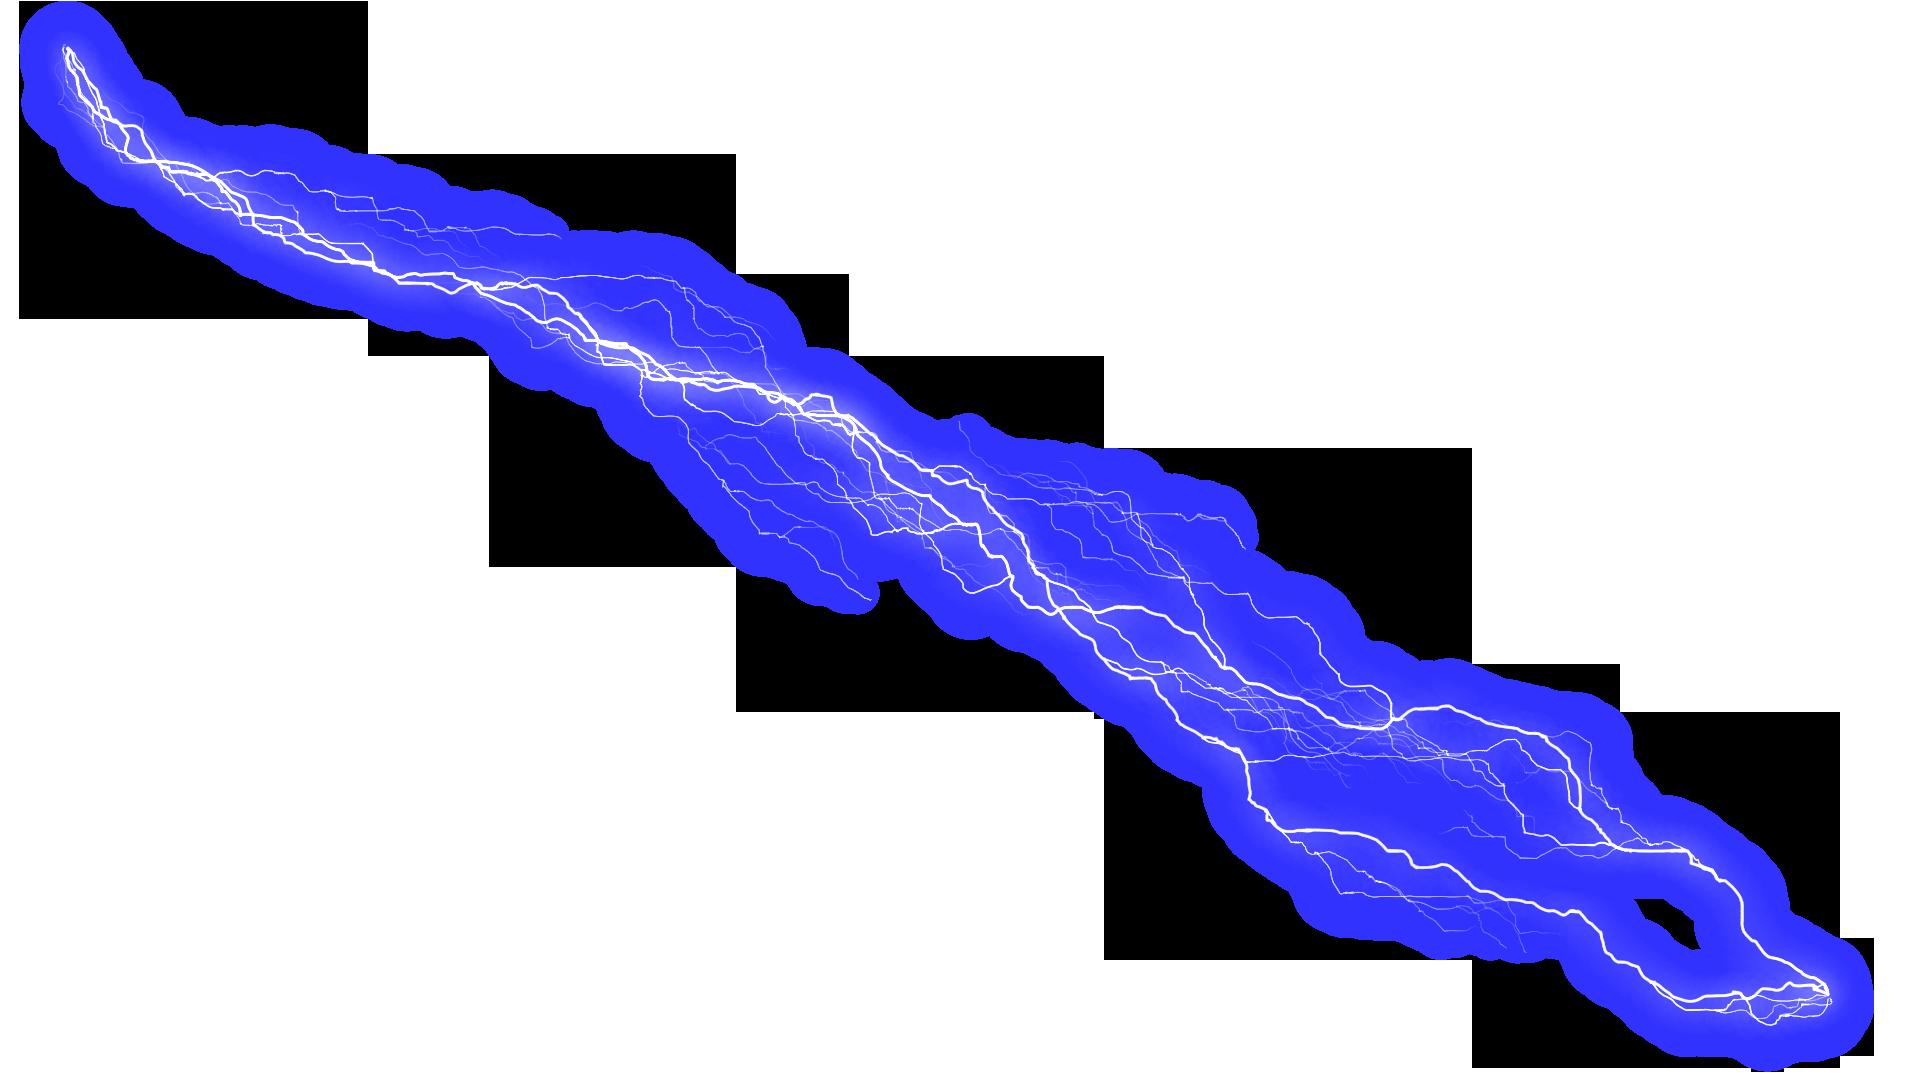 Big Explosion Png Png Image Purepng: Lightning PNG Image - PurePNG